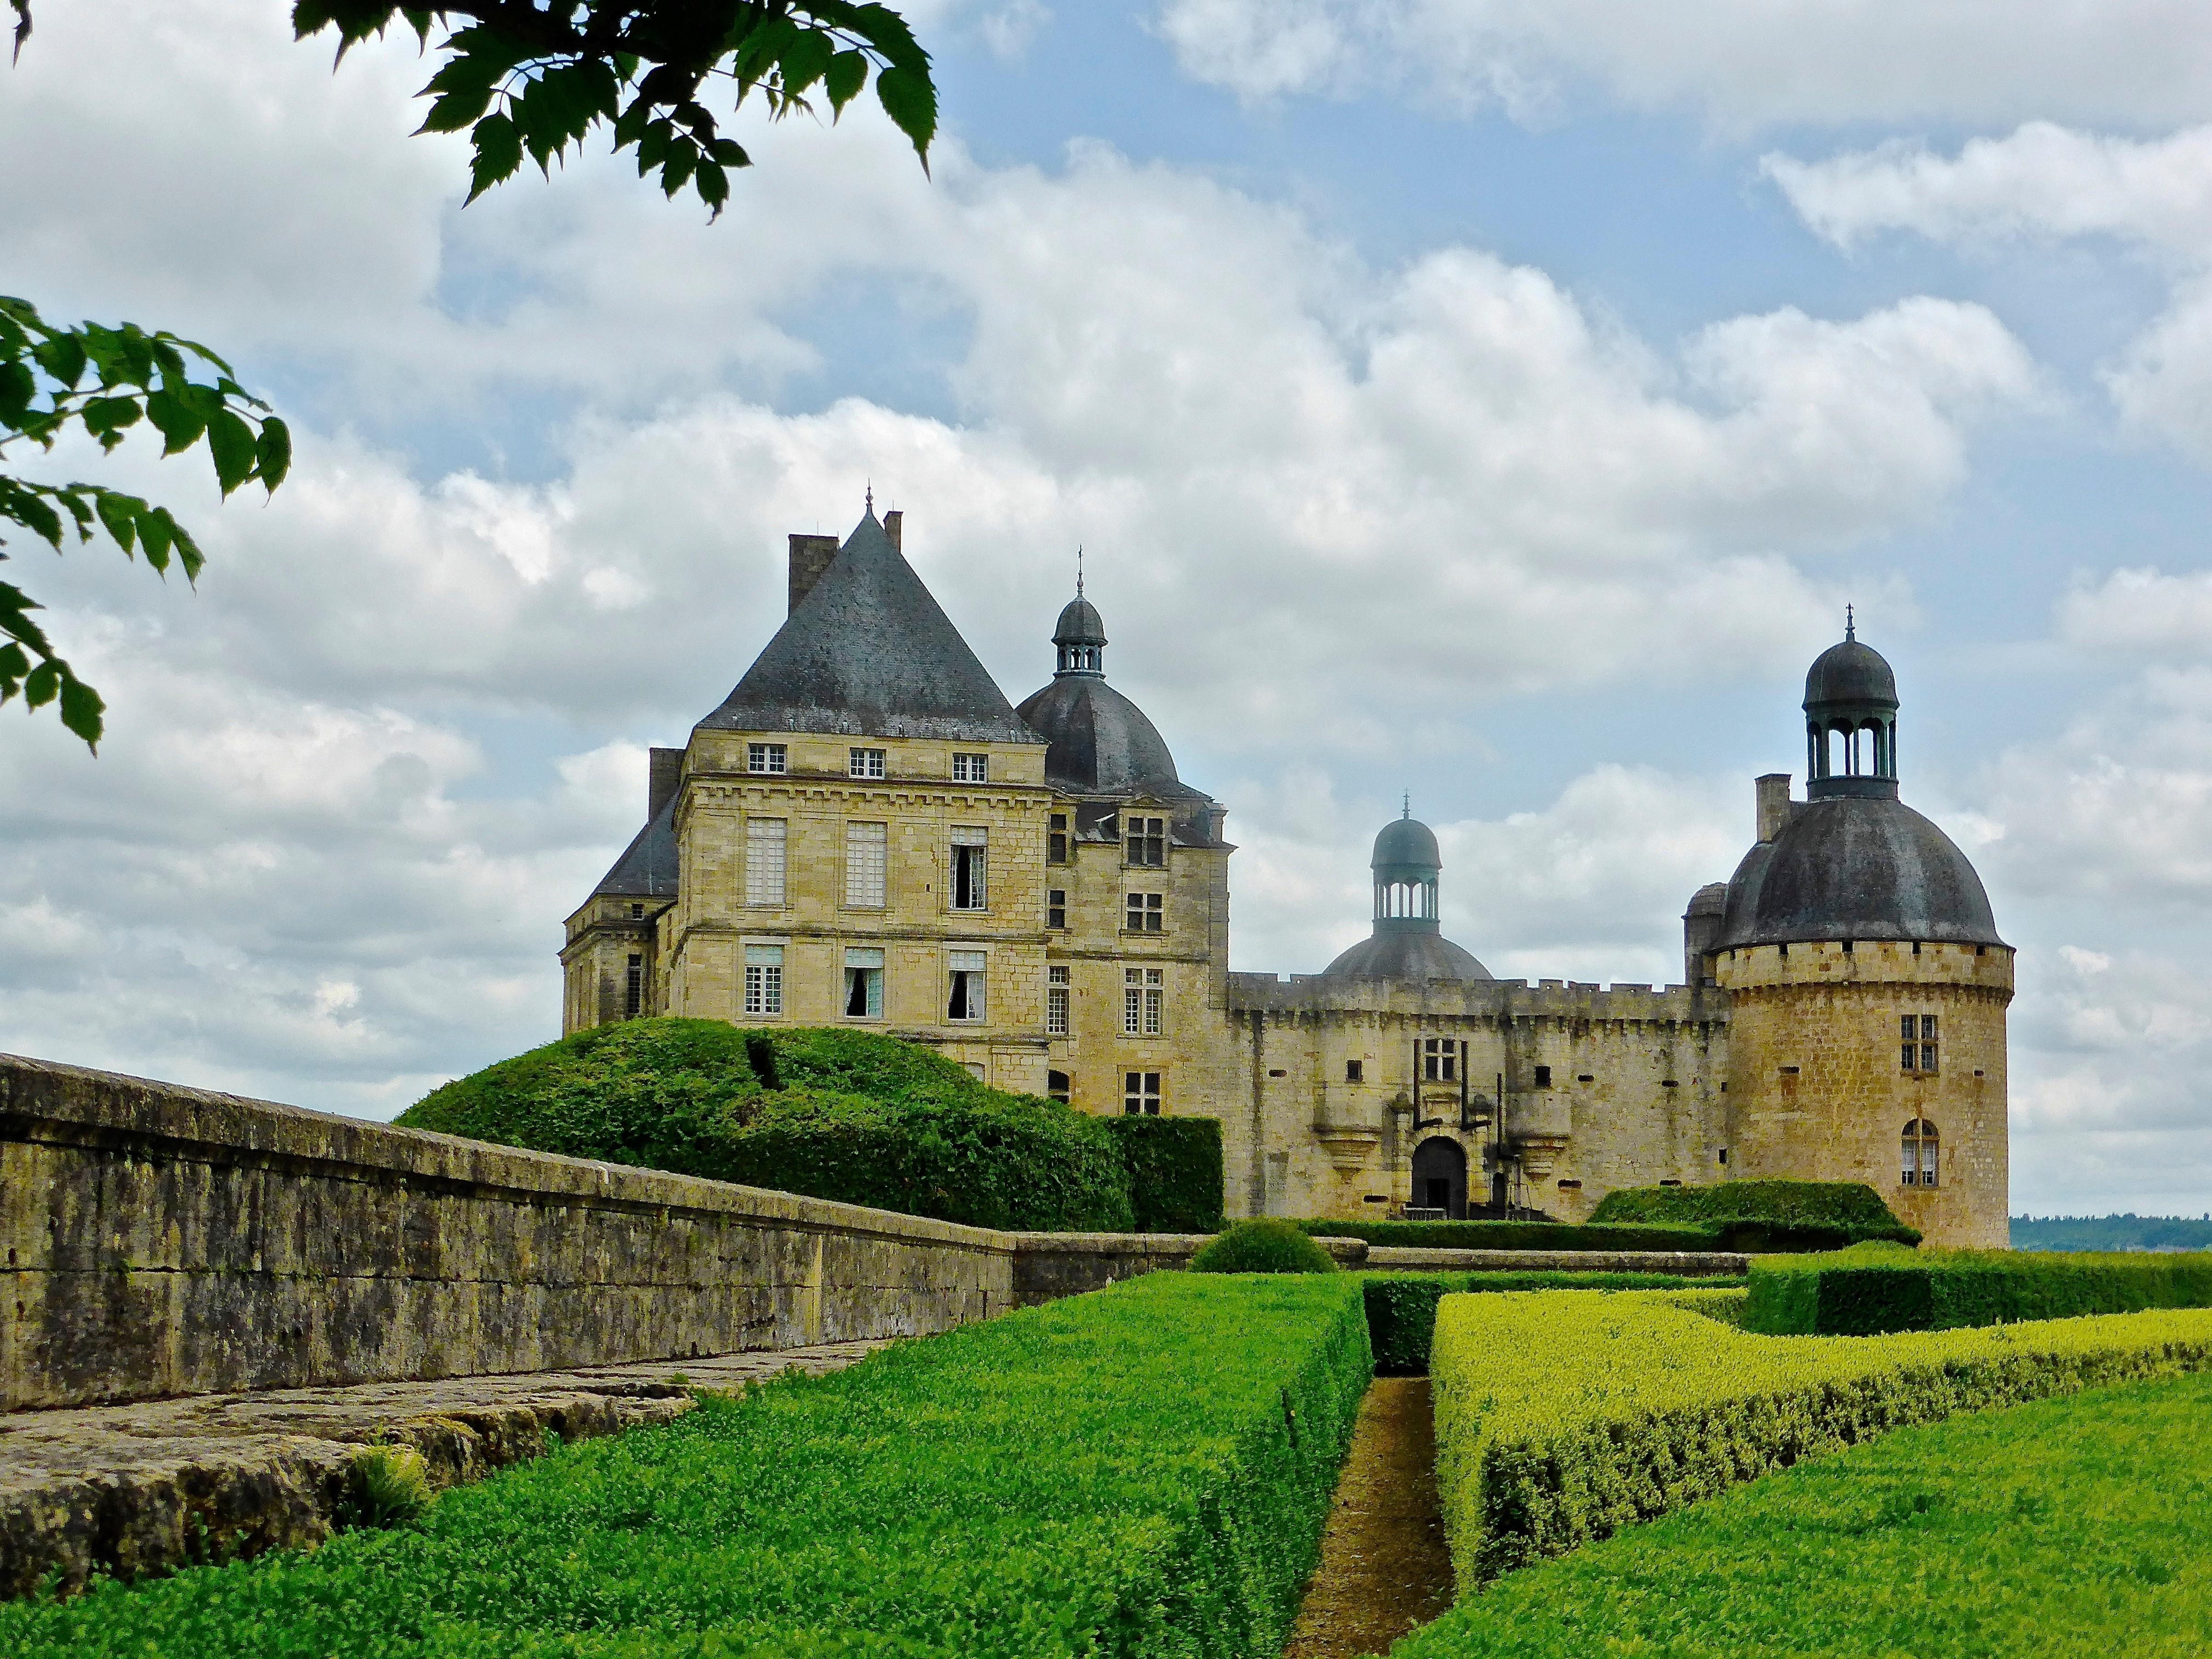 Architecture Building Chateau France Castle Landmark Historic Garden  Medieval Monastery History Heritage Estate Dordogne Moat Rural